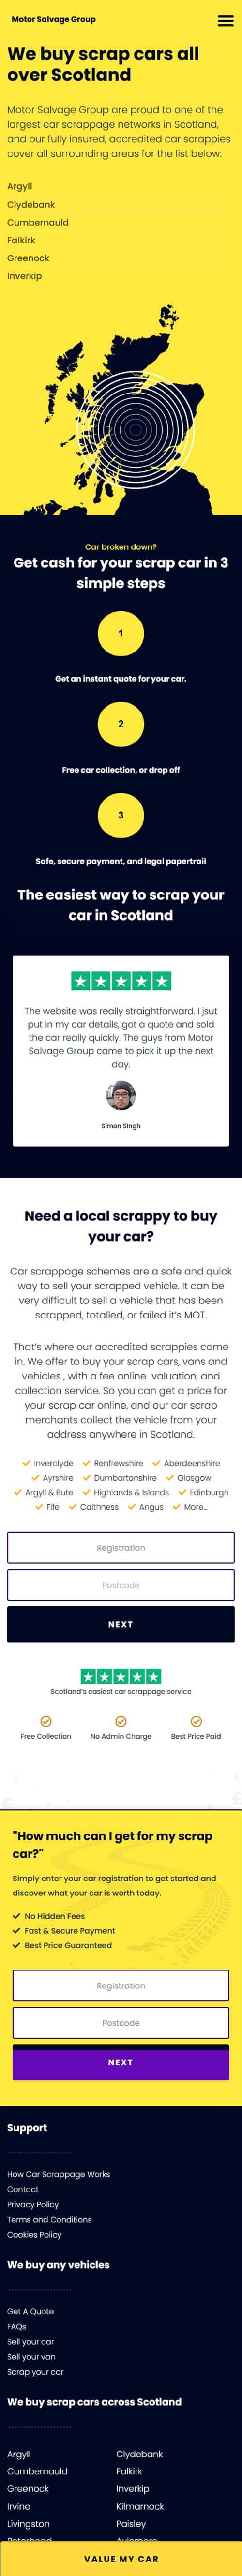 mobile website for car business